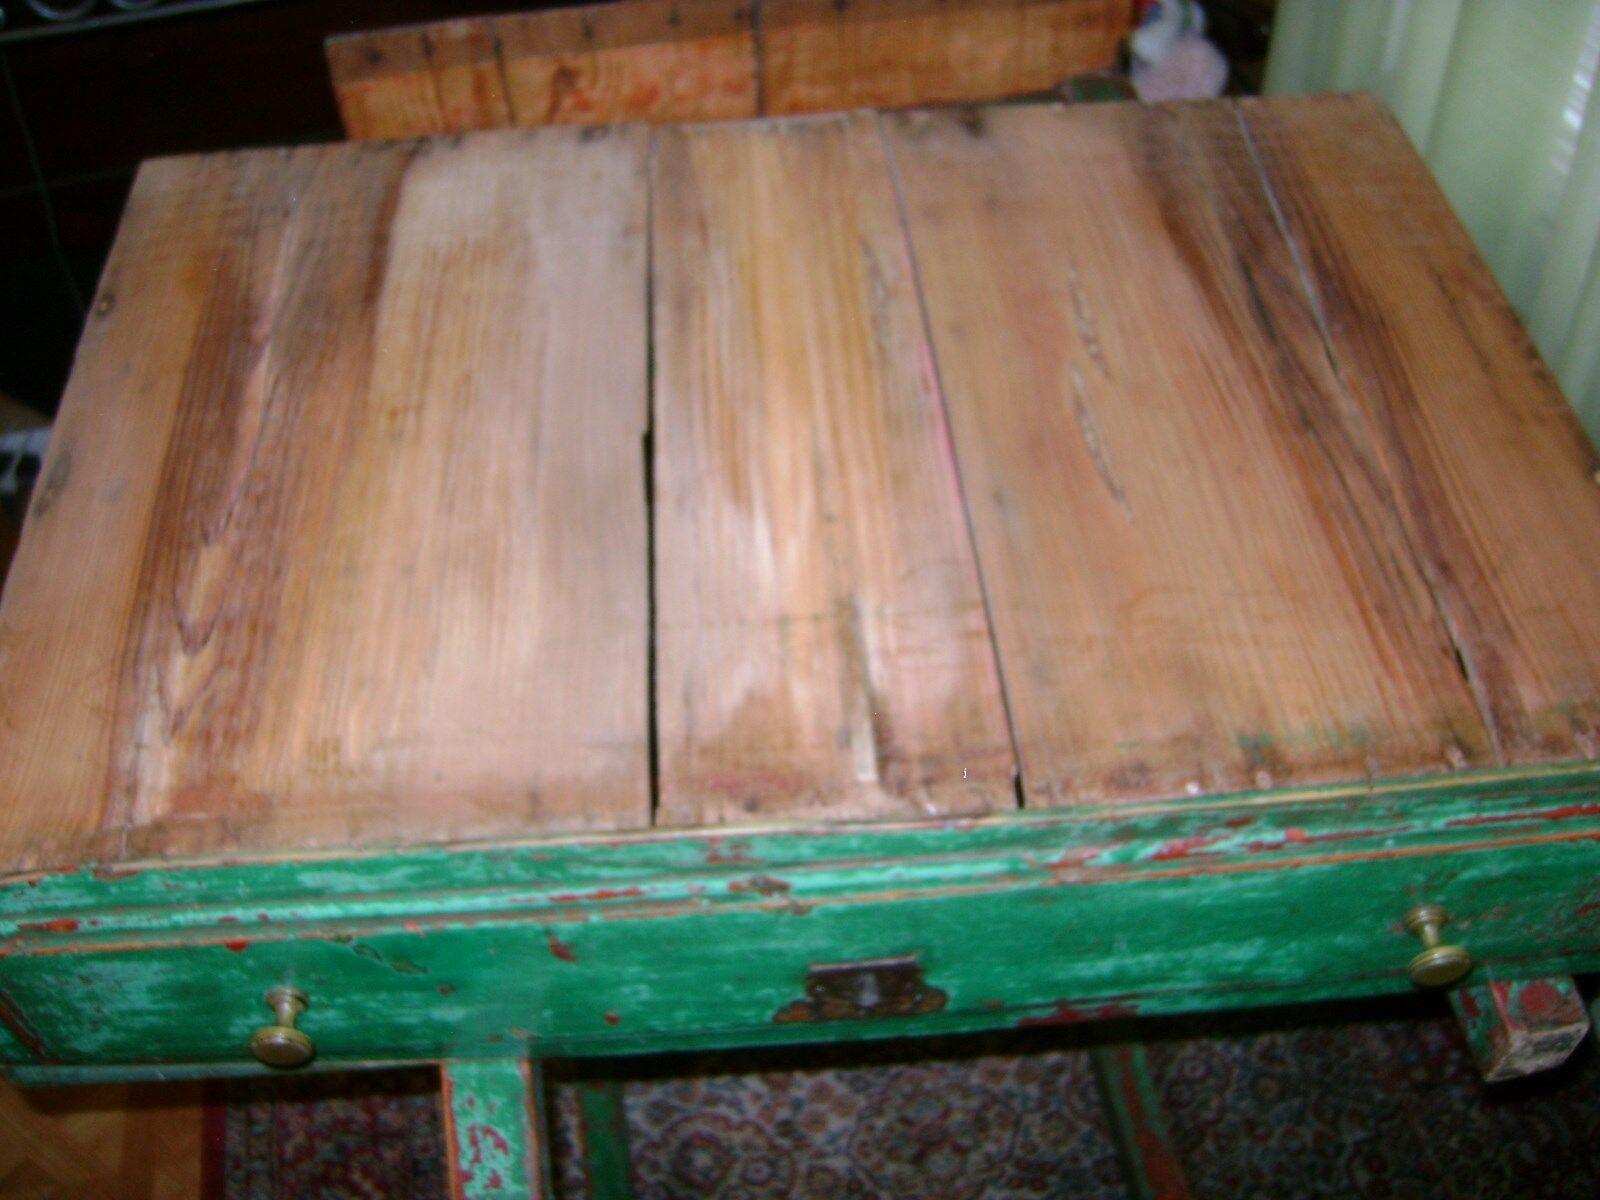 VOILA 39 1/2 W X 22 D X 29 1/2 H Spanish Table REPLICA 18th Century WOOD  - $999.99